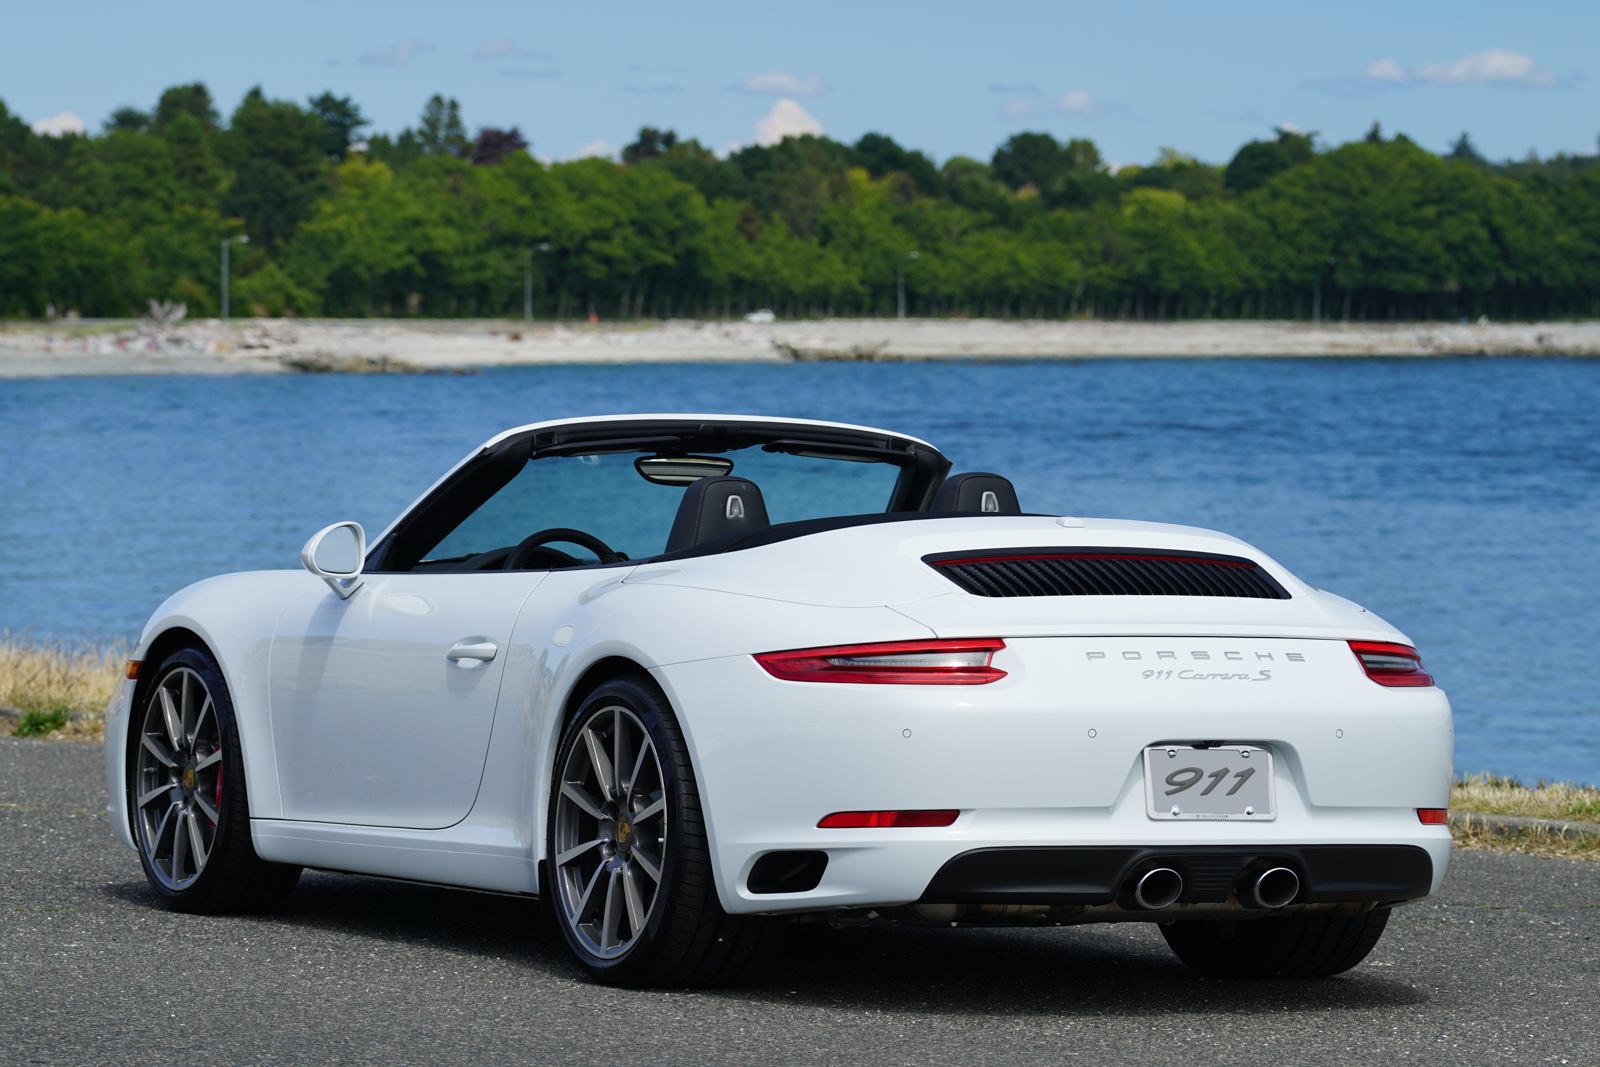 2017 porsche 911 carrera s cabriolet for sale silver. Black Bedroom Furniture Sets. Home Design Ideas